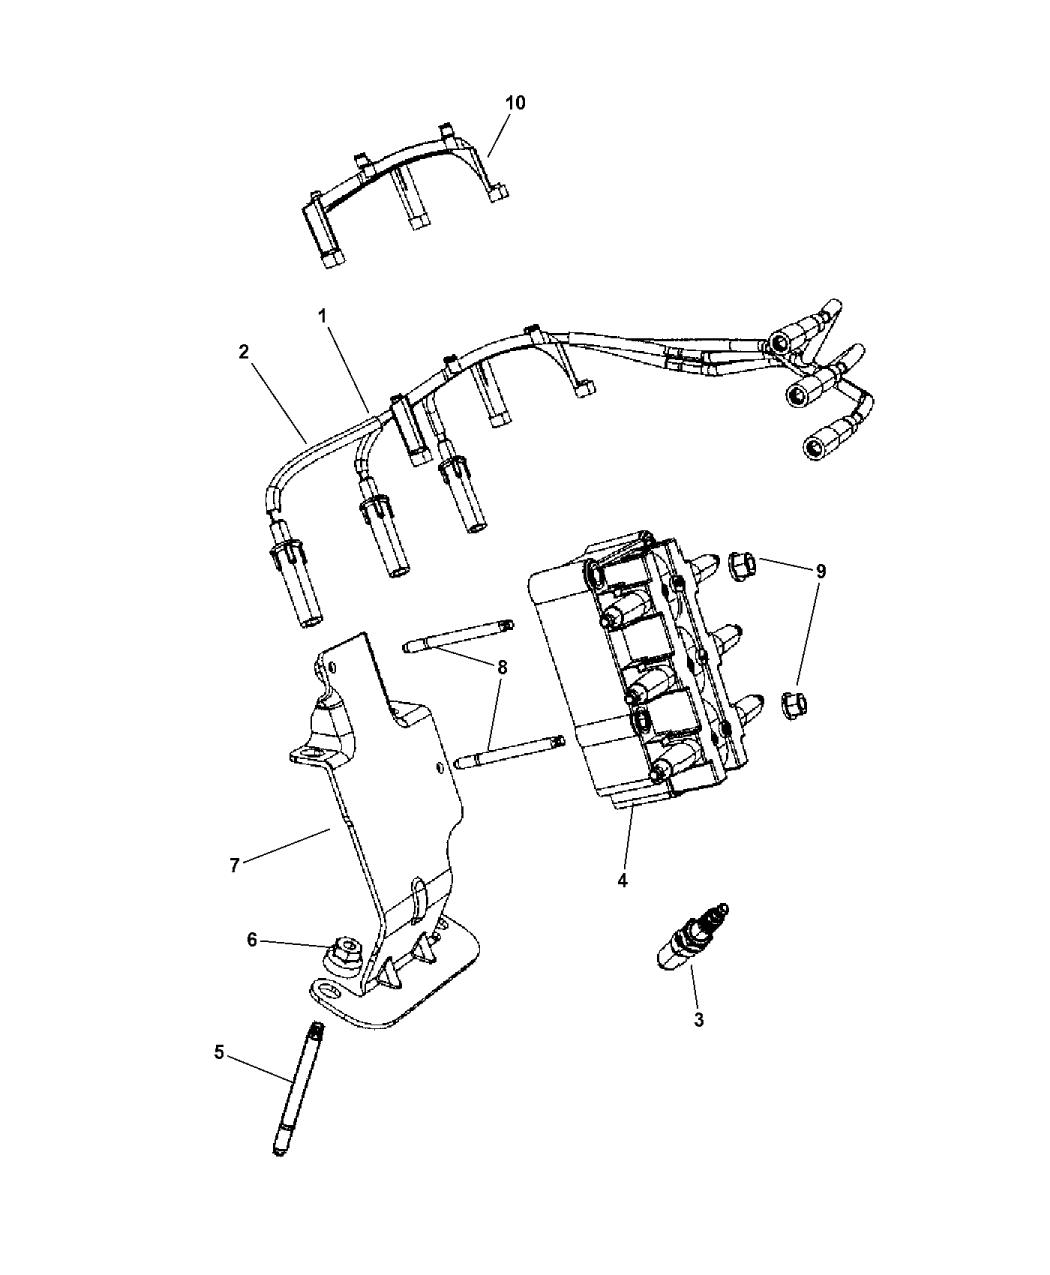 2007 Jeep Wrangler Spark Plugs, Cables & Coils